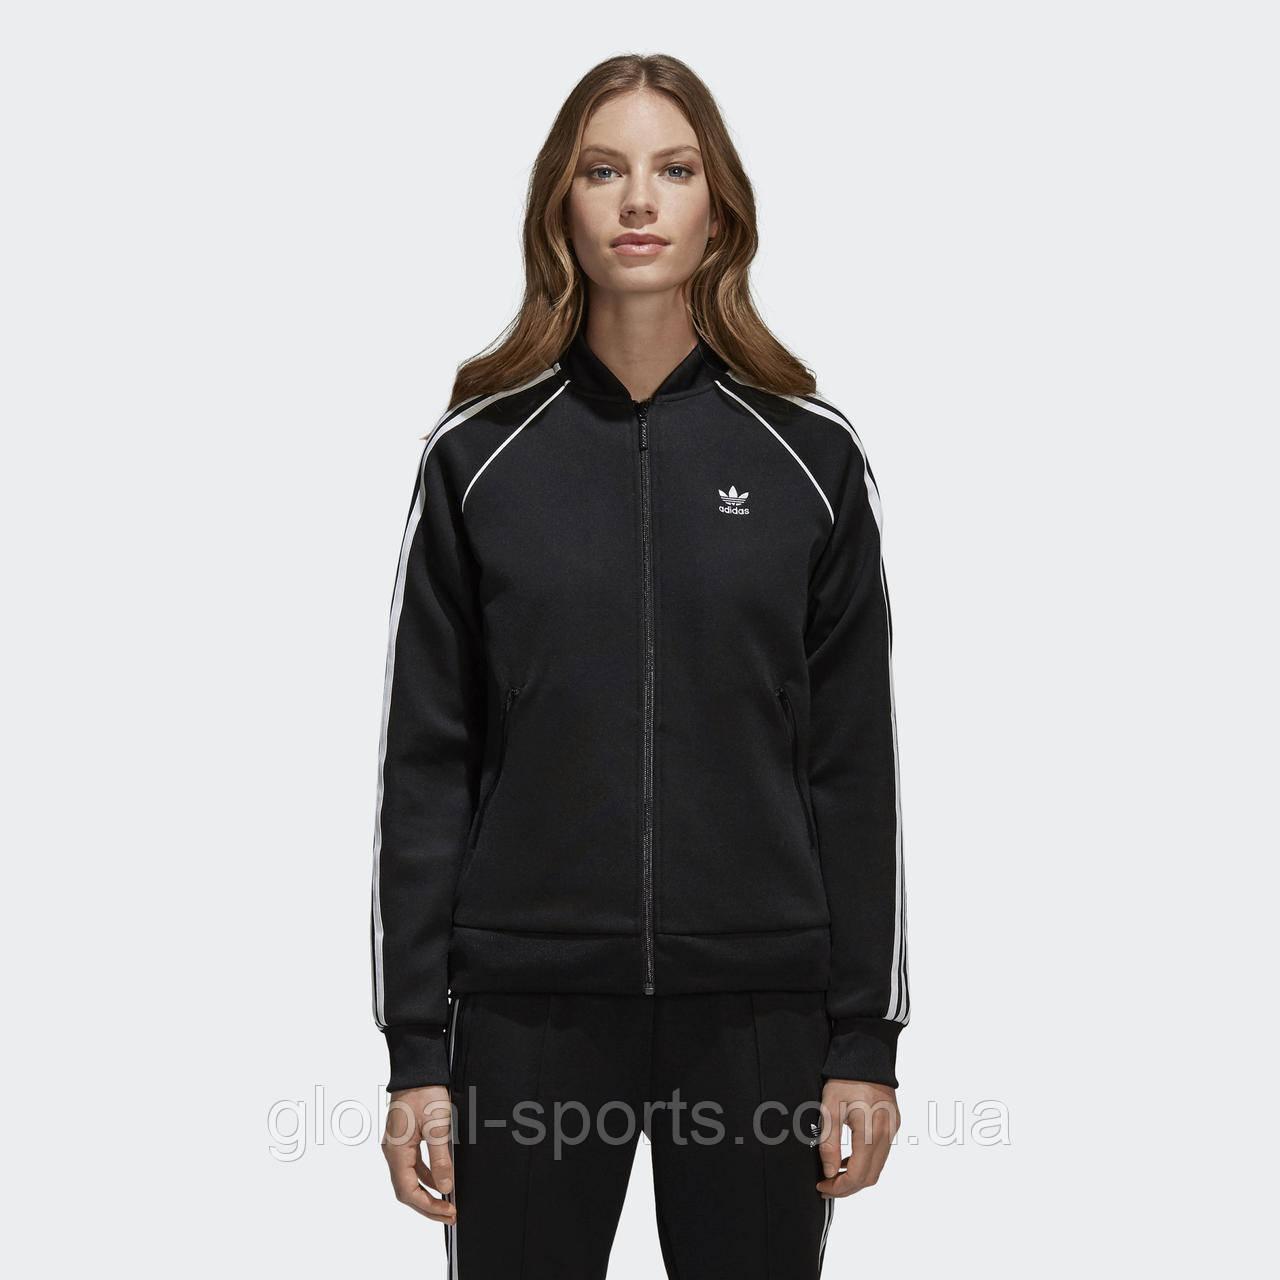 Женская олимпийка Adidas Originals SST (Артикул:CE2392)